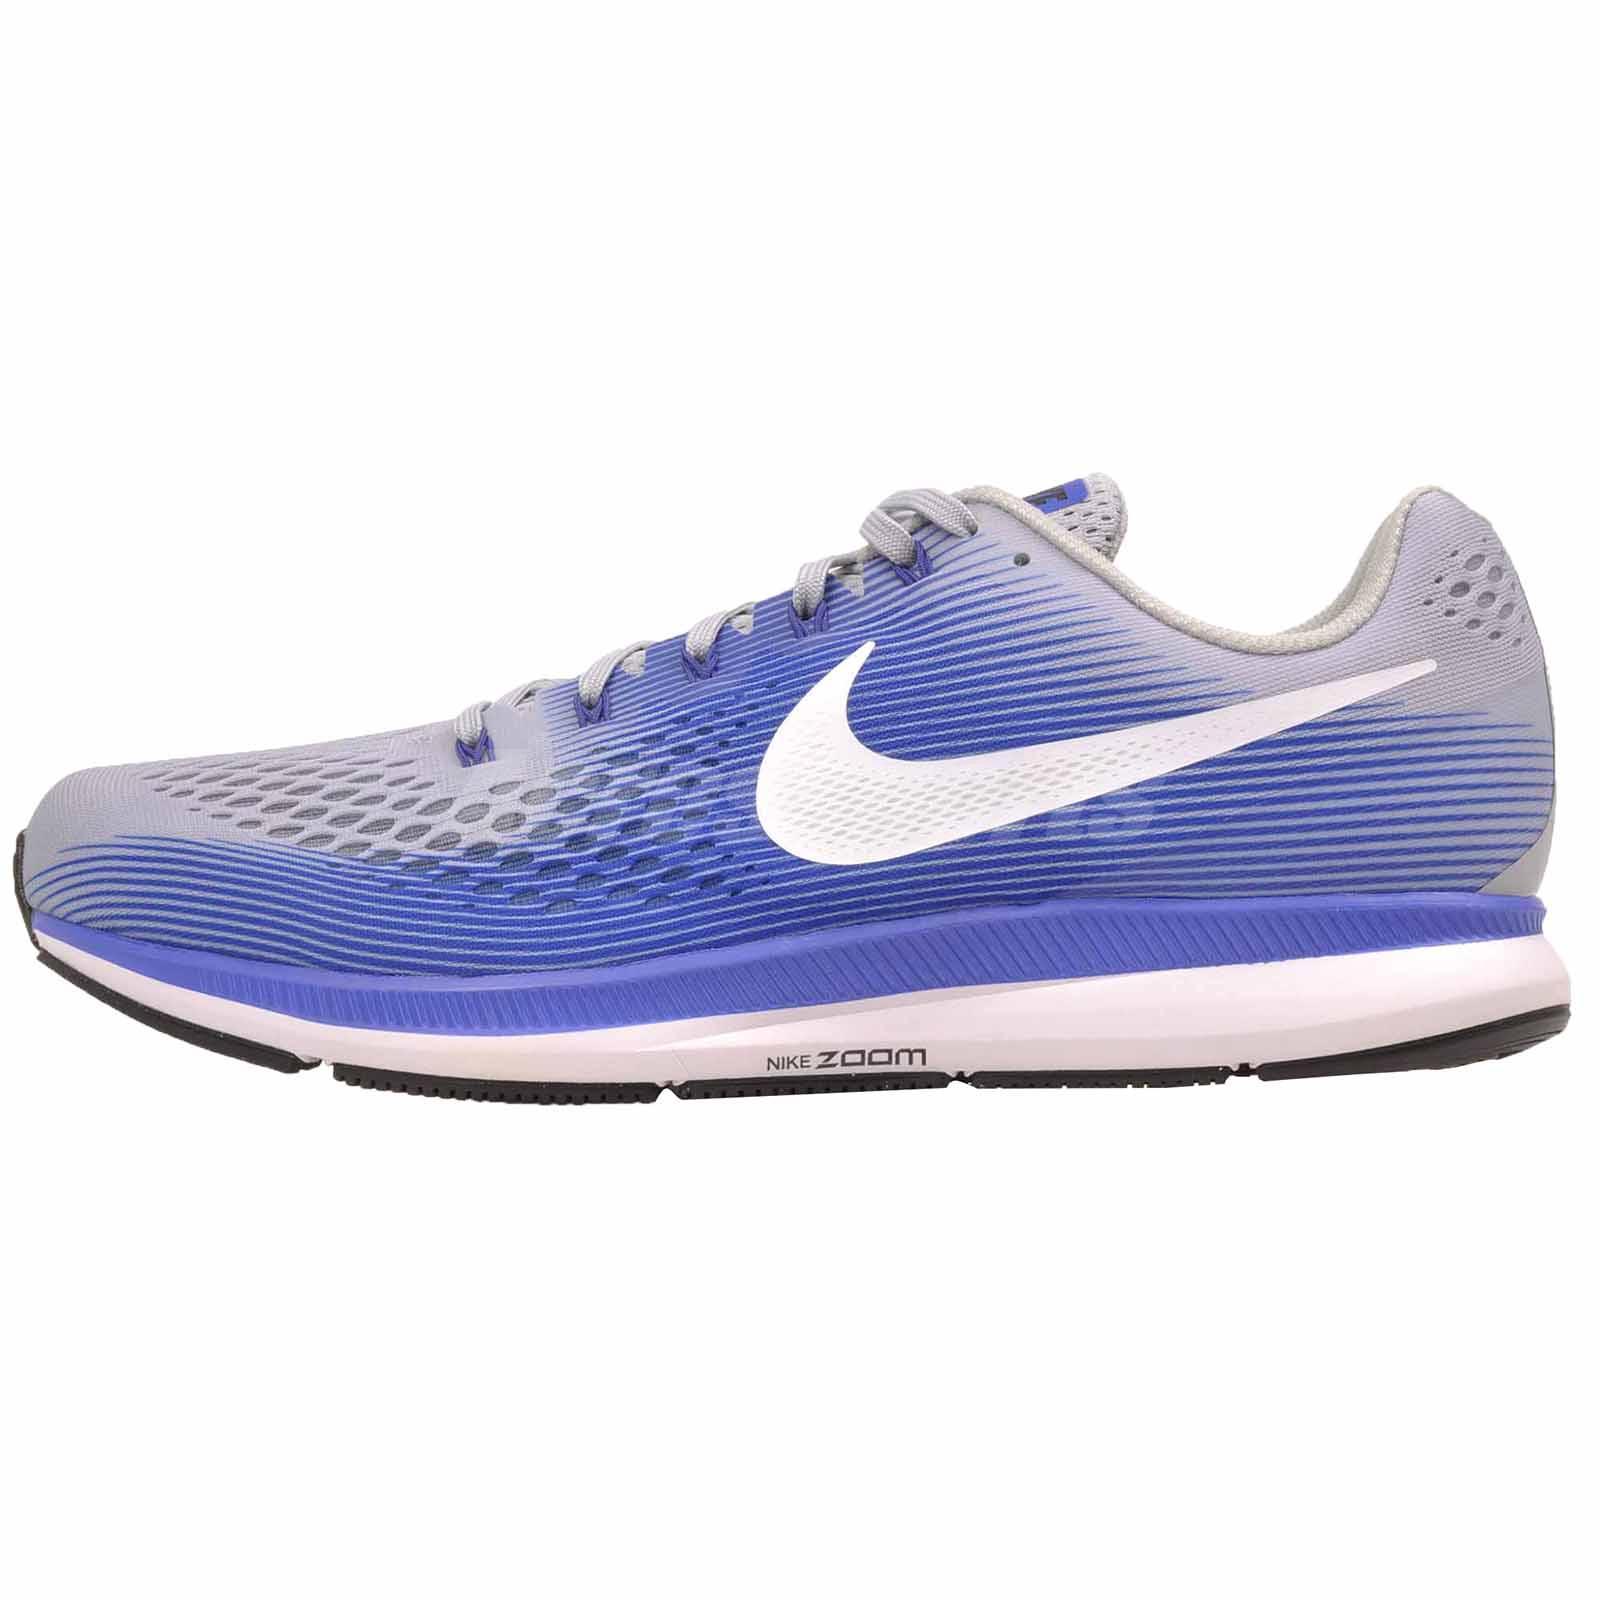 san francisco b09cd b22f1 Details about Nike Air Zoom Pegasus 34 (4E) Running Shoes Mens Wide Grey  Blue 880557-007